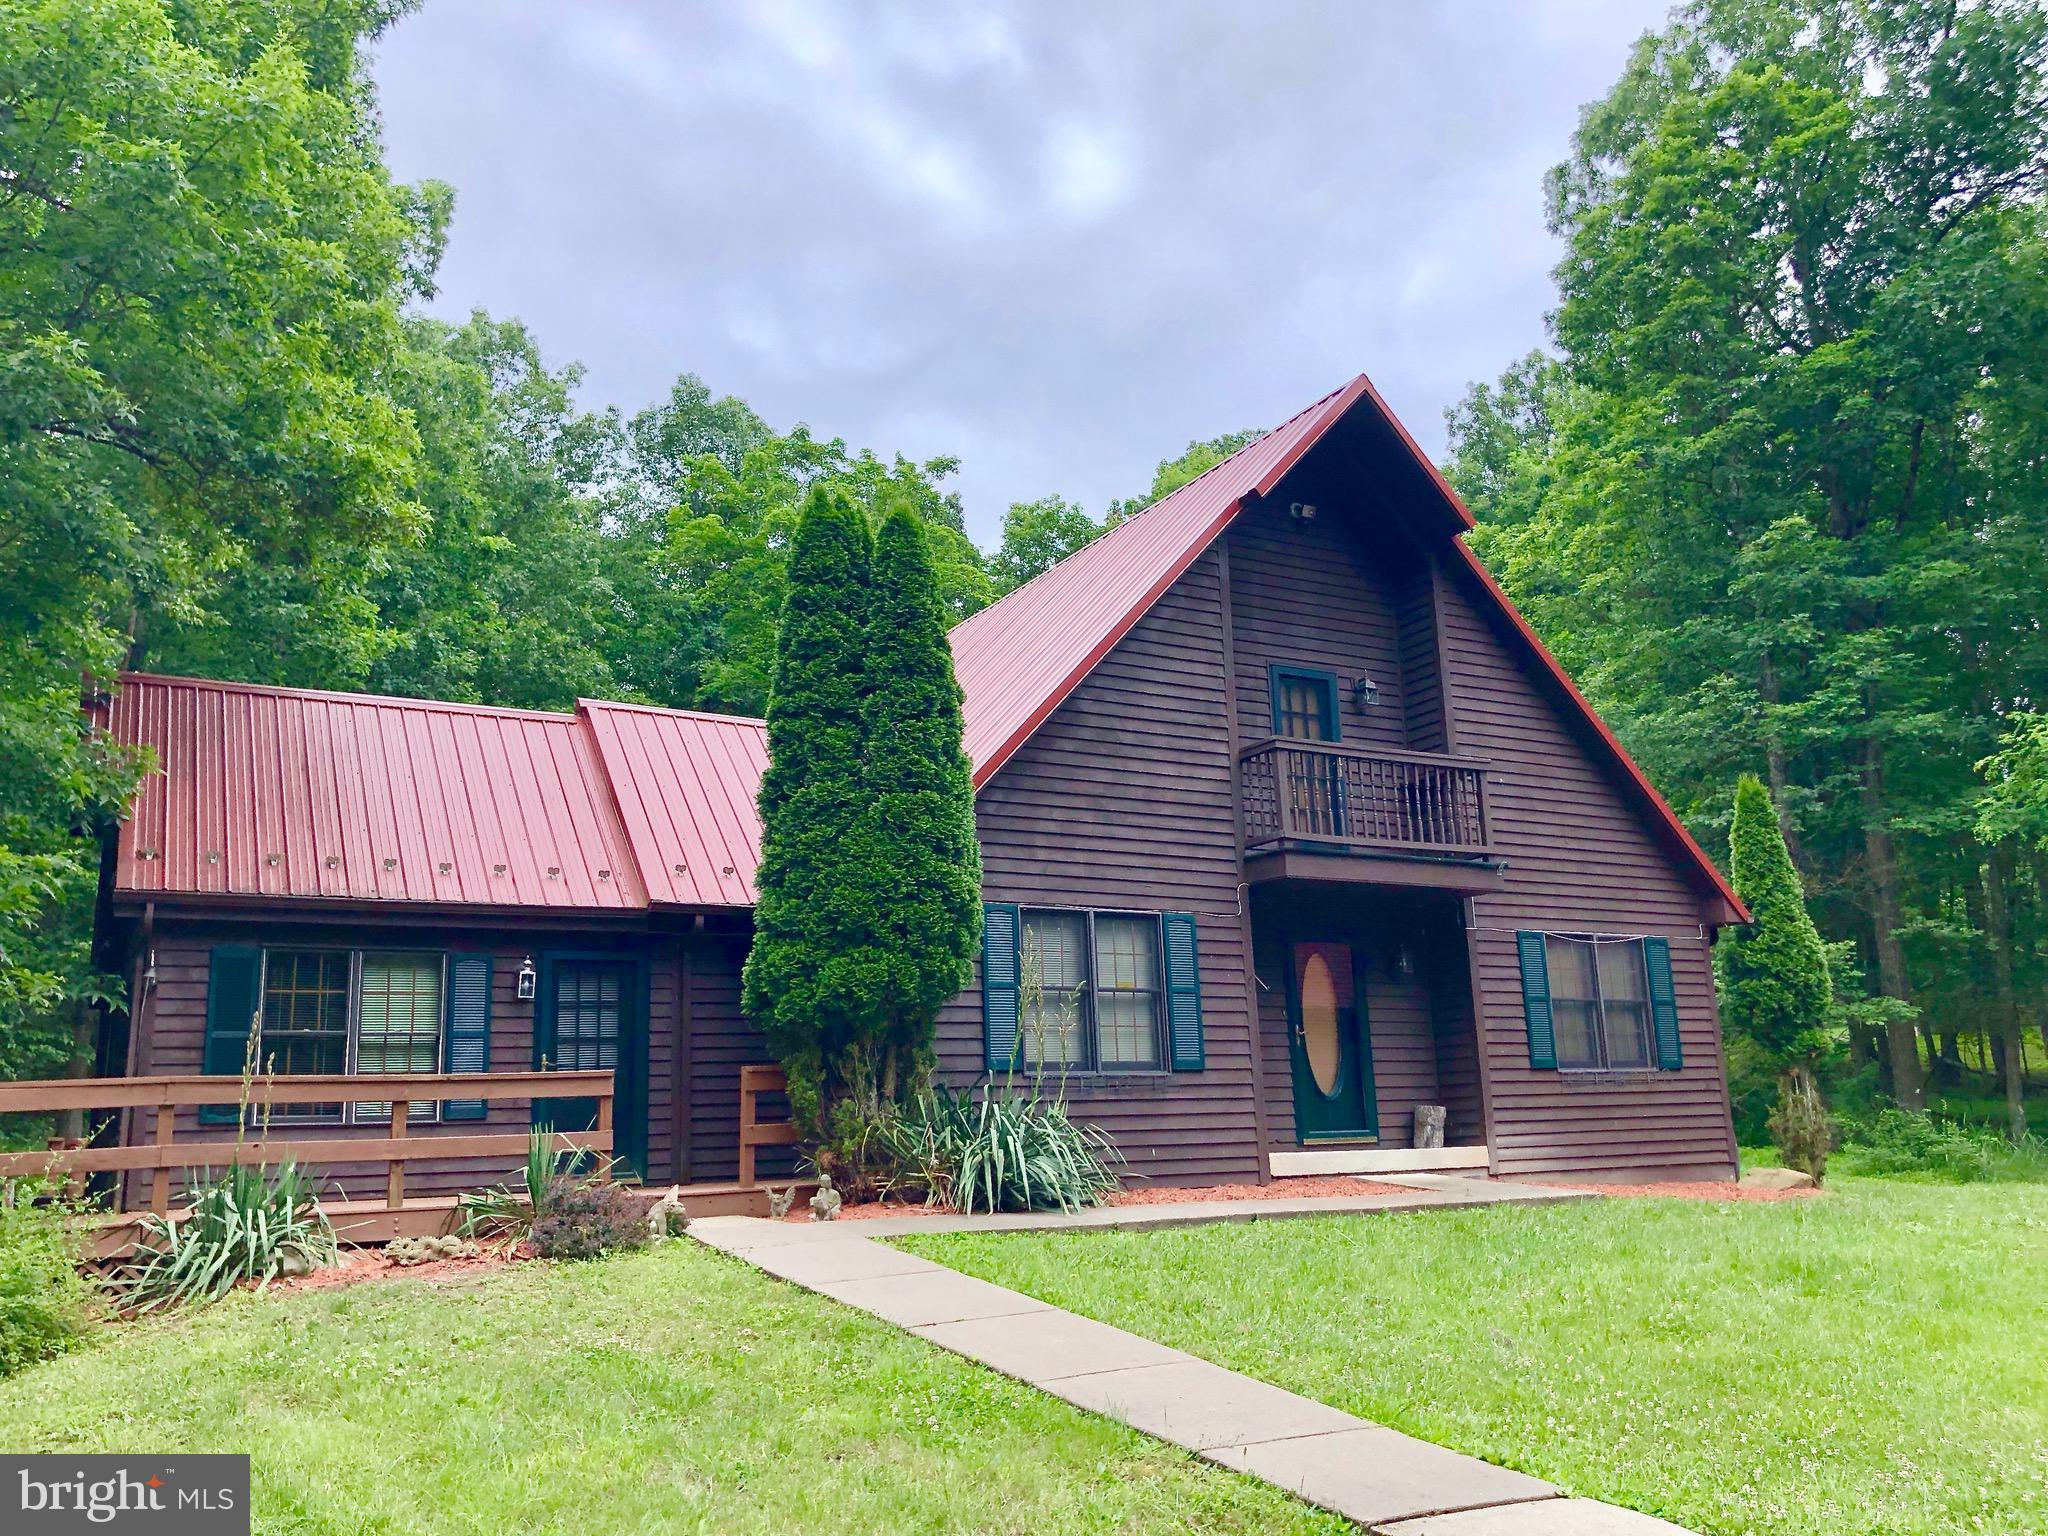 189 LYLE HOUSE ROAD, MATHIAS, WV 26812